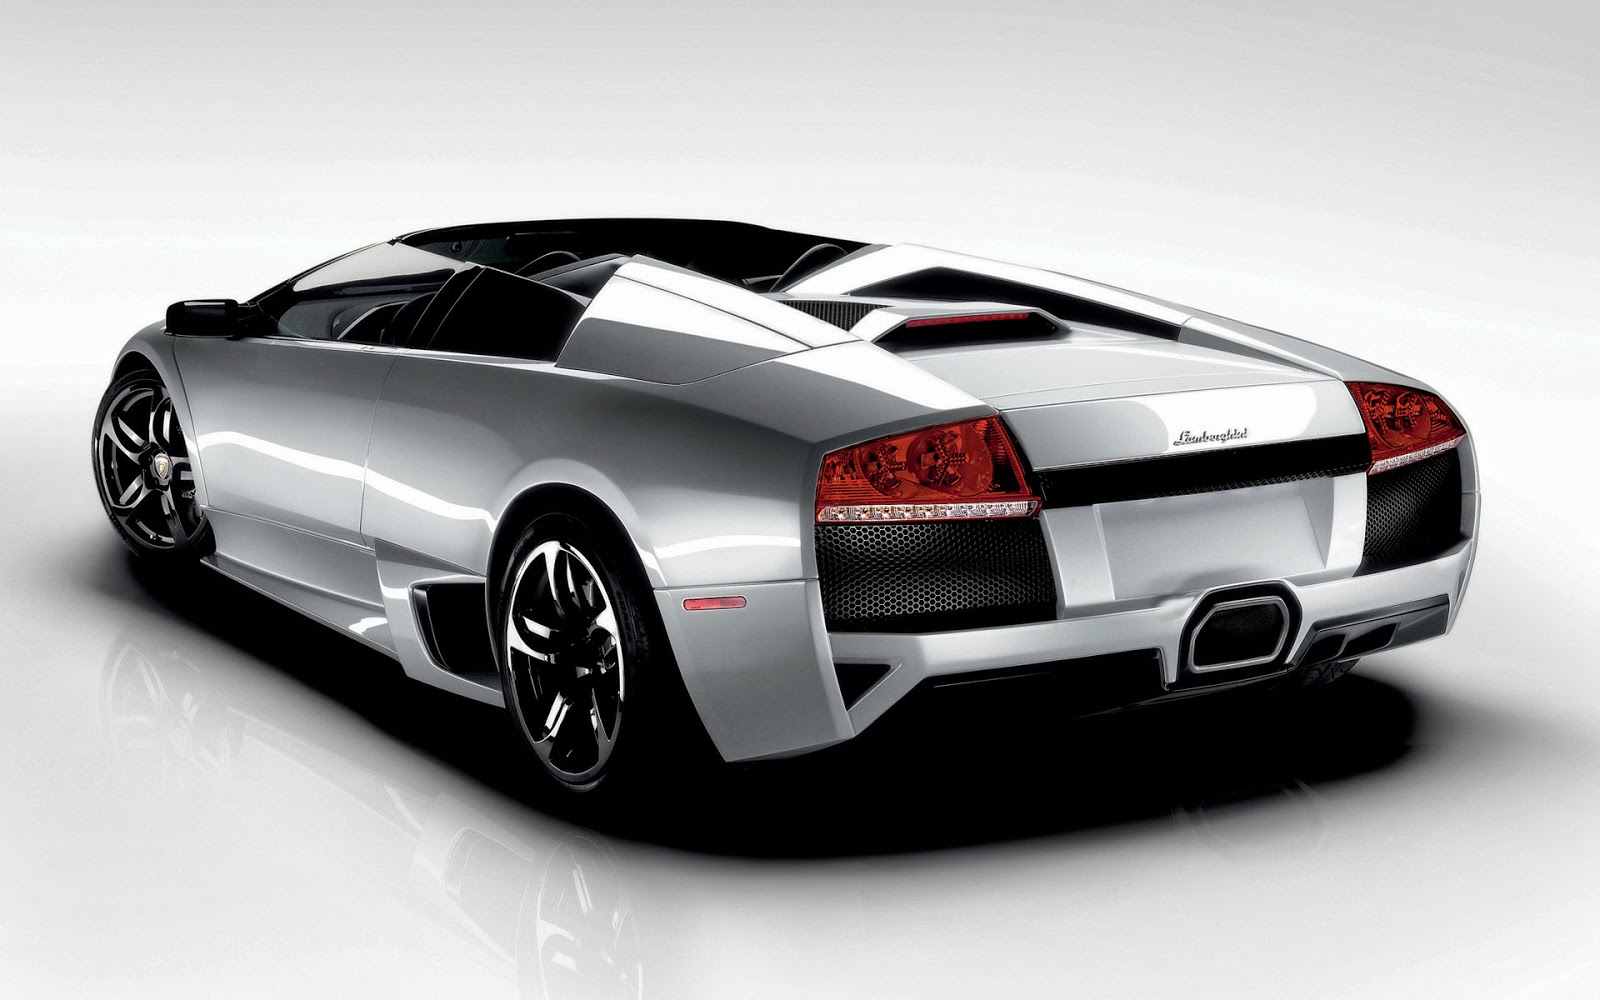 Fondos De Pantalla Coches: Fondos HD Wallpapers: Fondo De Pantalla Coche Lamborghini